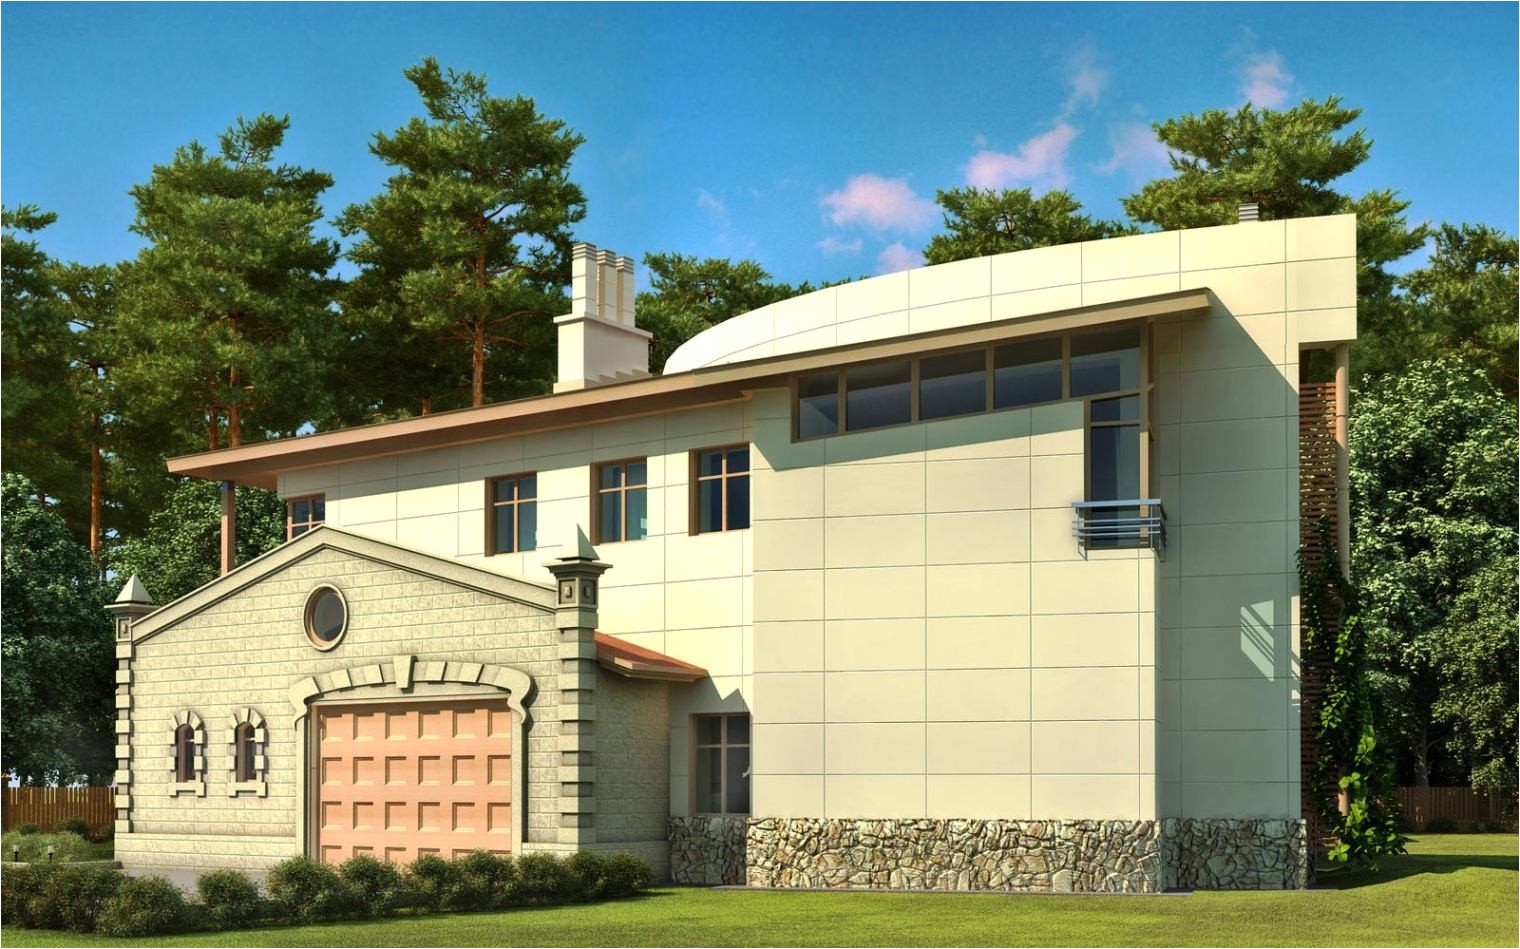 874646 house plans americas best arts marvelous americas best home plans great ideas 2